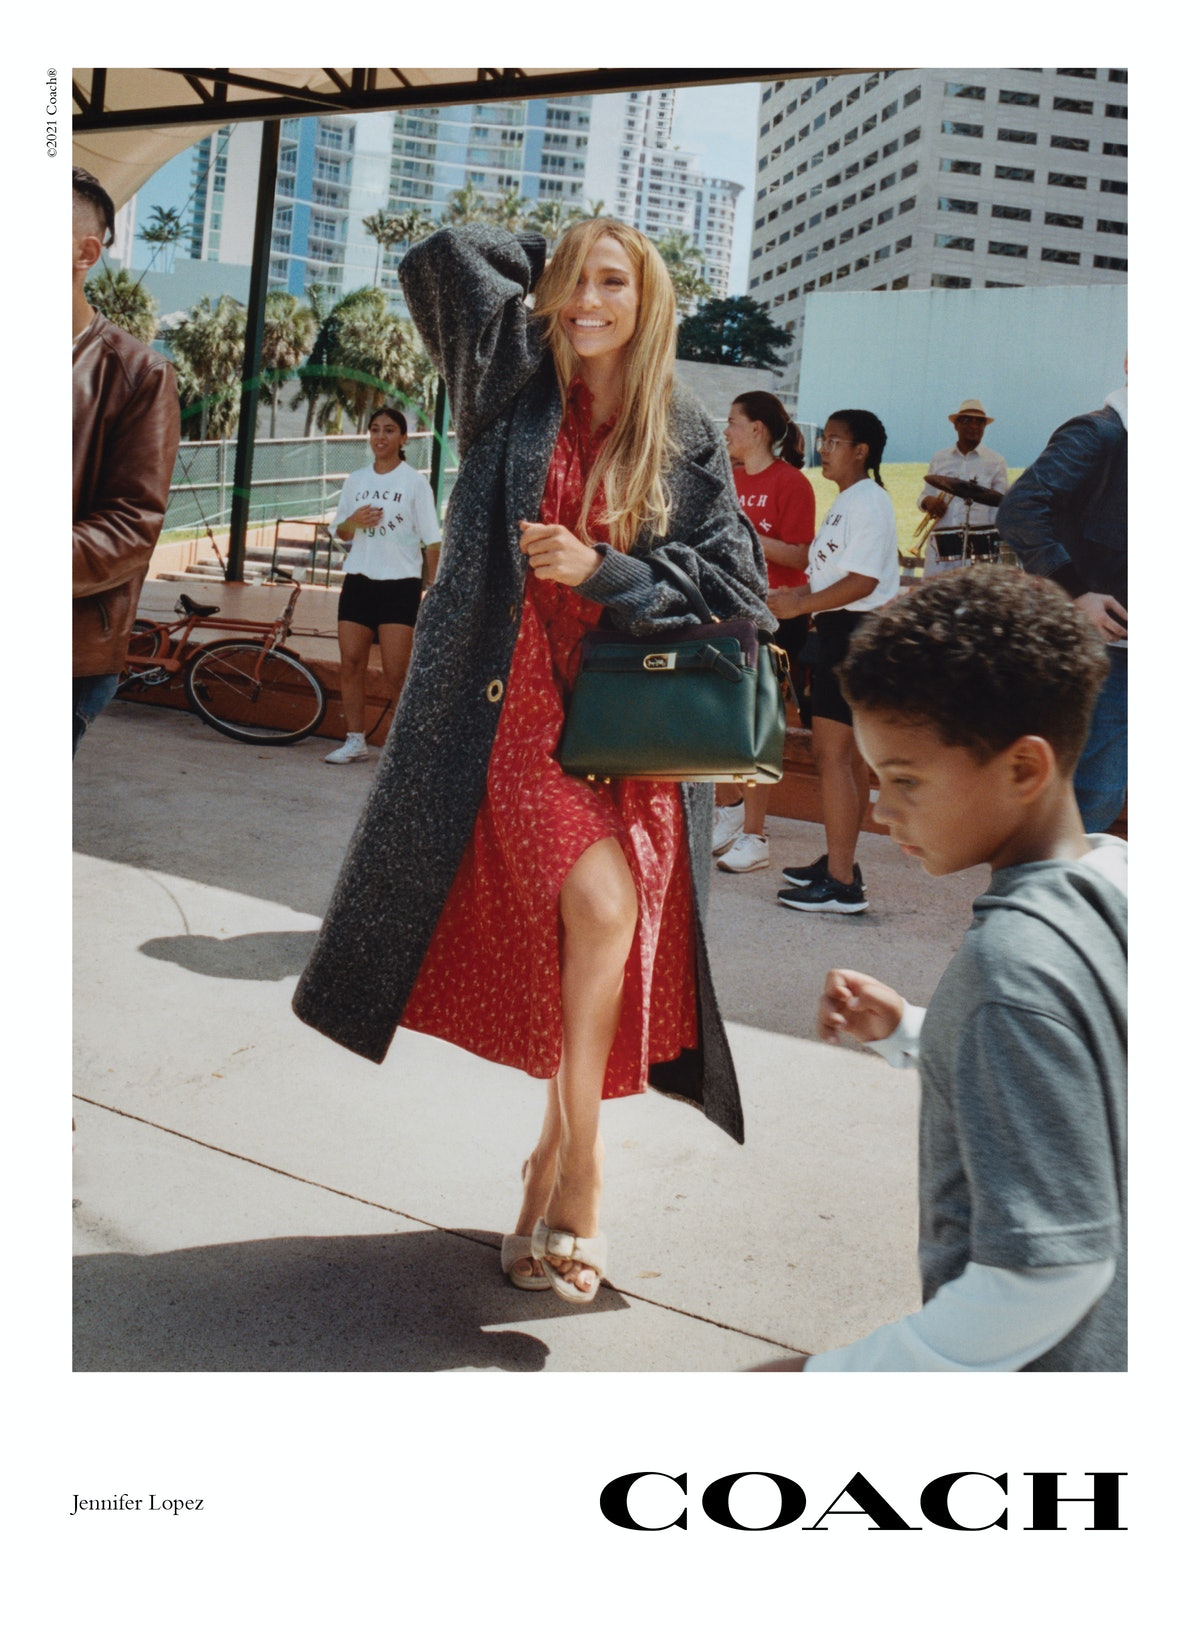 Jennifer Lopez stars in the Coach Fall/Winter 2021 campaign.